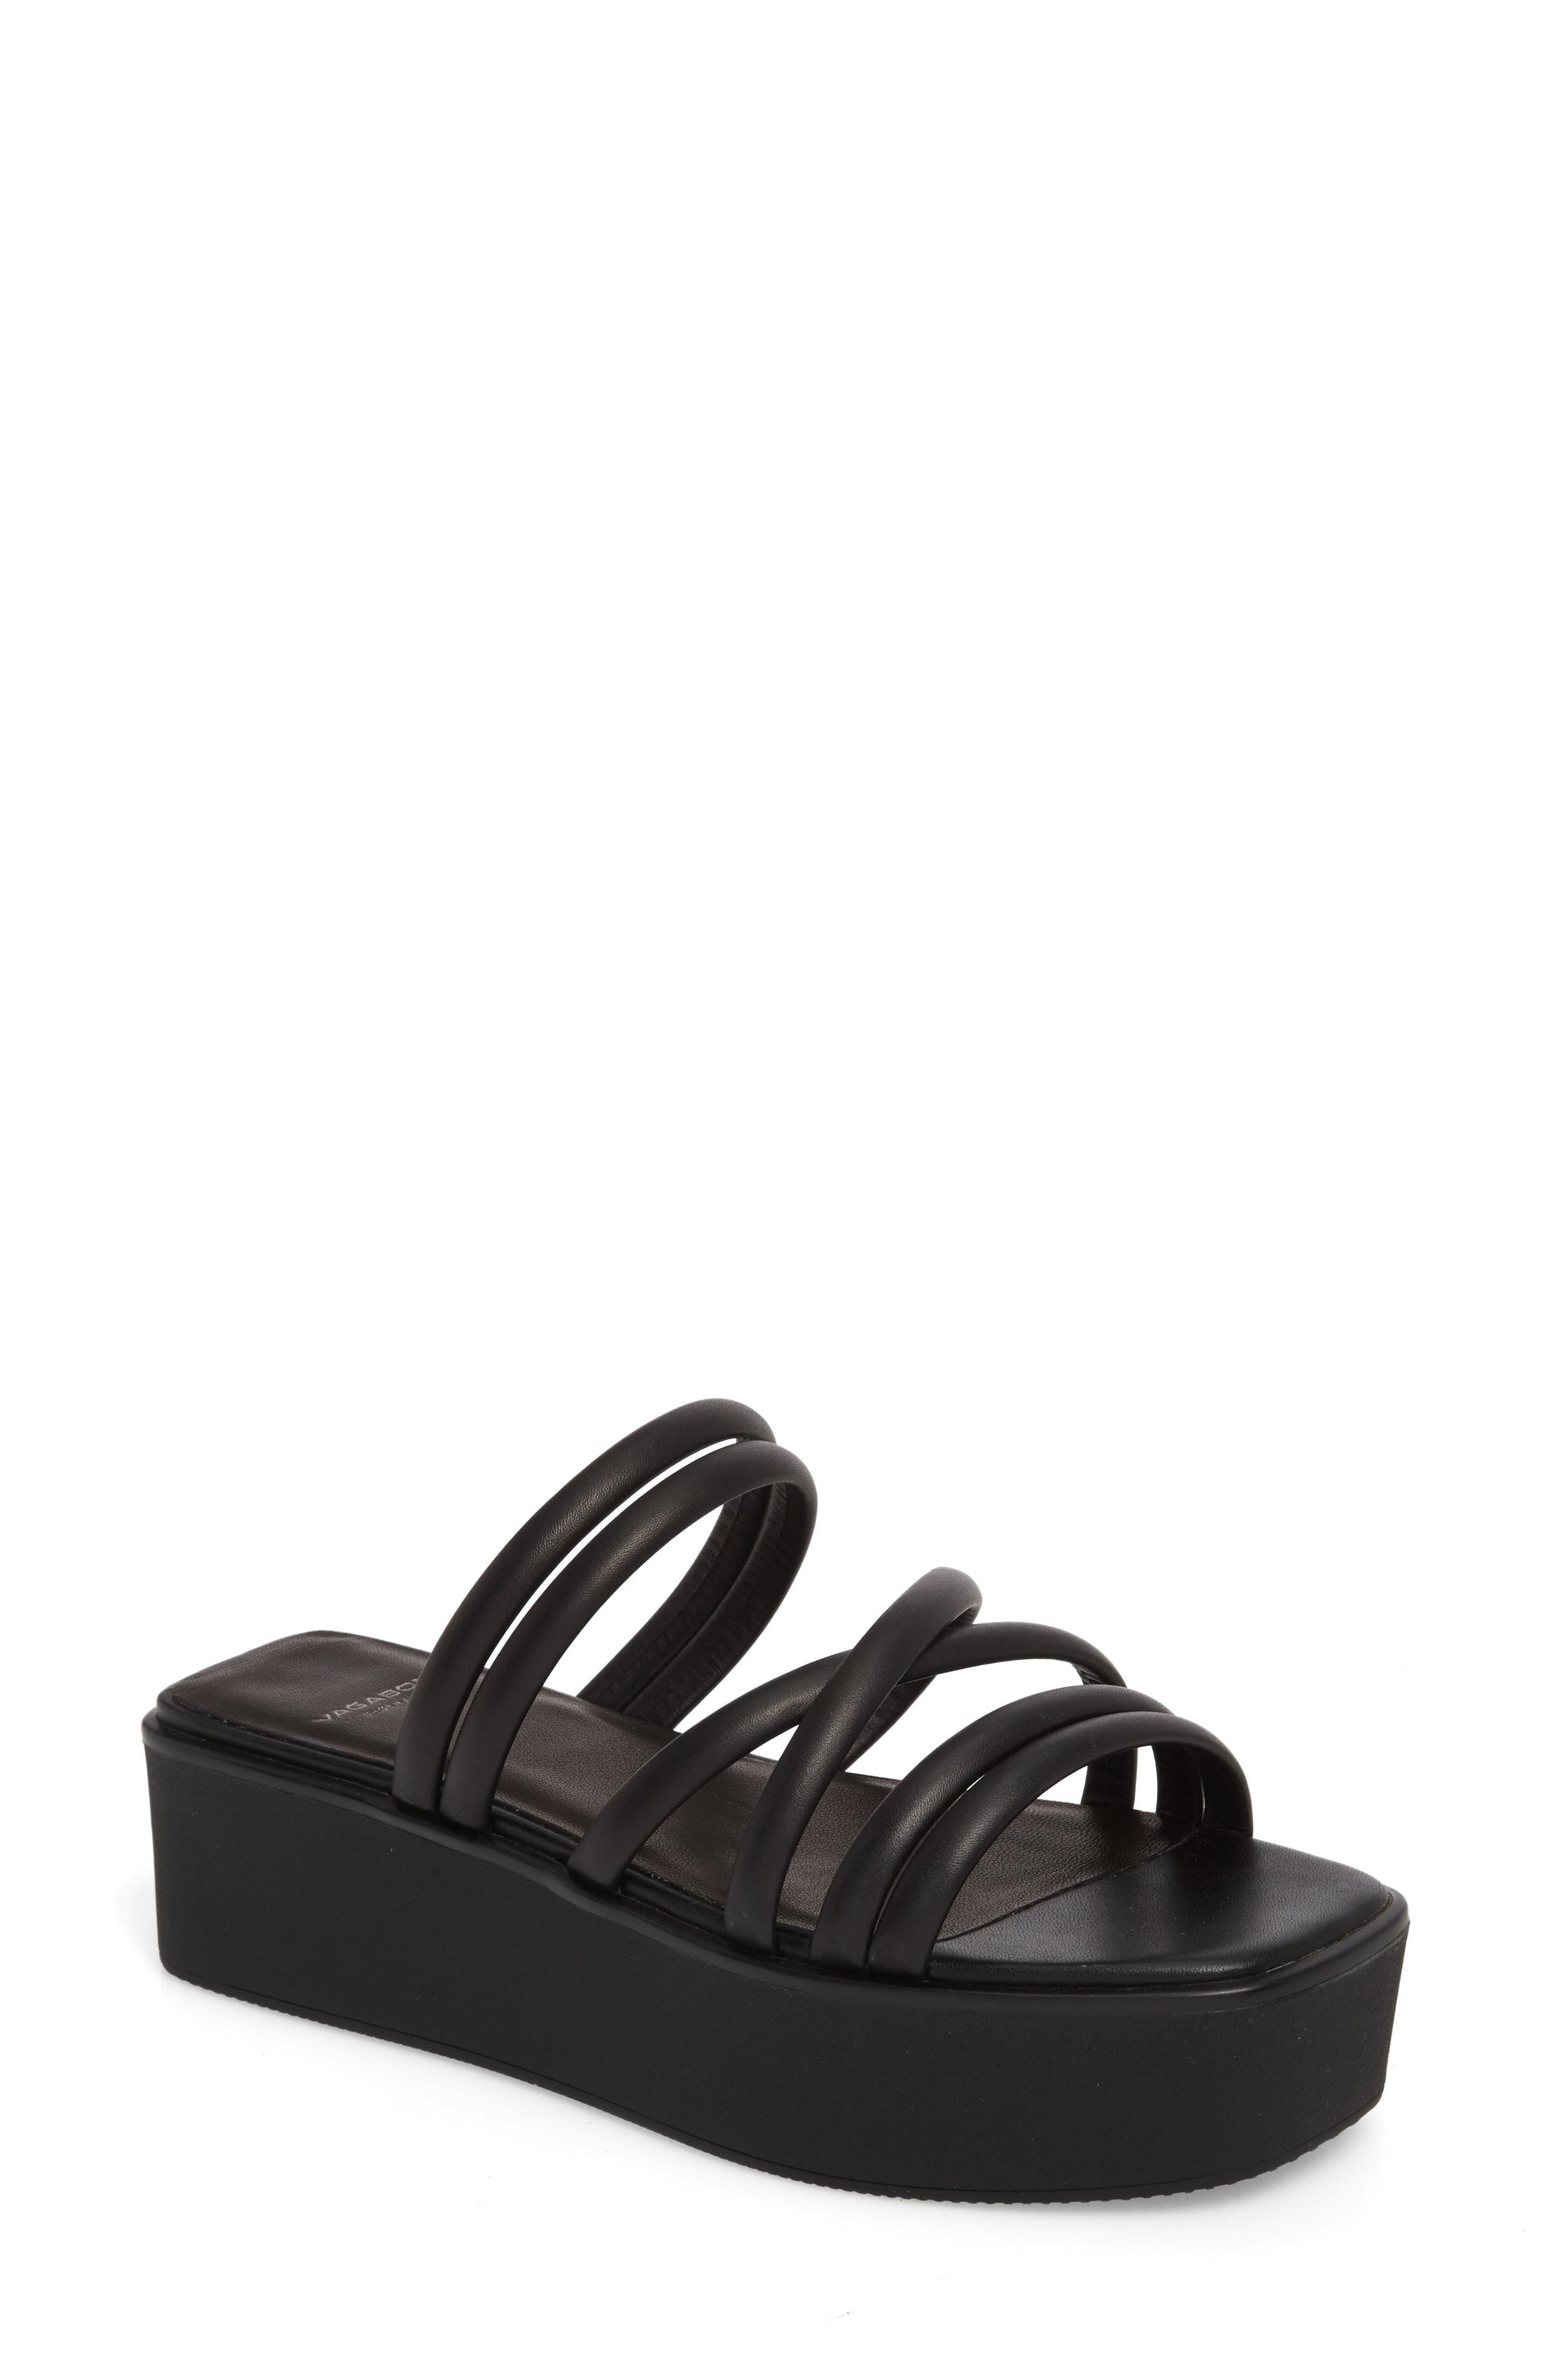 b223a5a1482 Vagabond Bonnie Platform Sandal in Black - Lyst